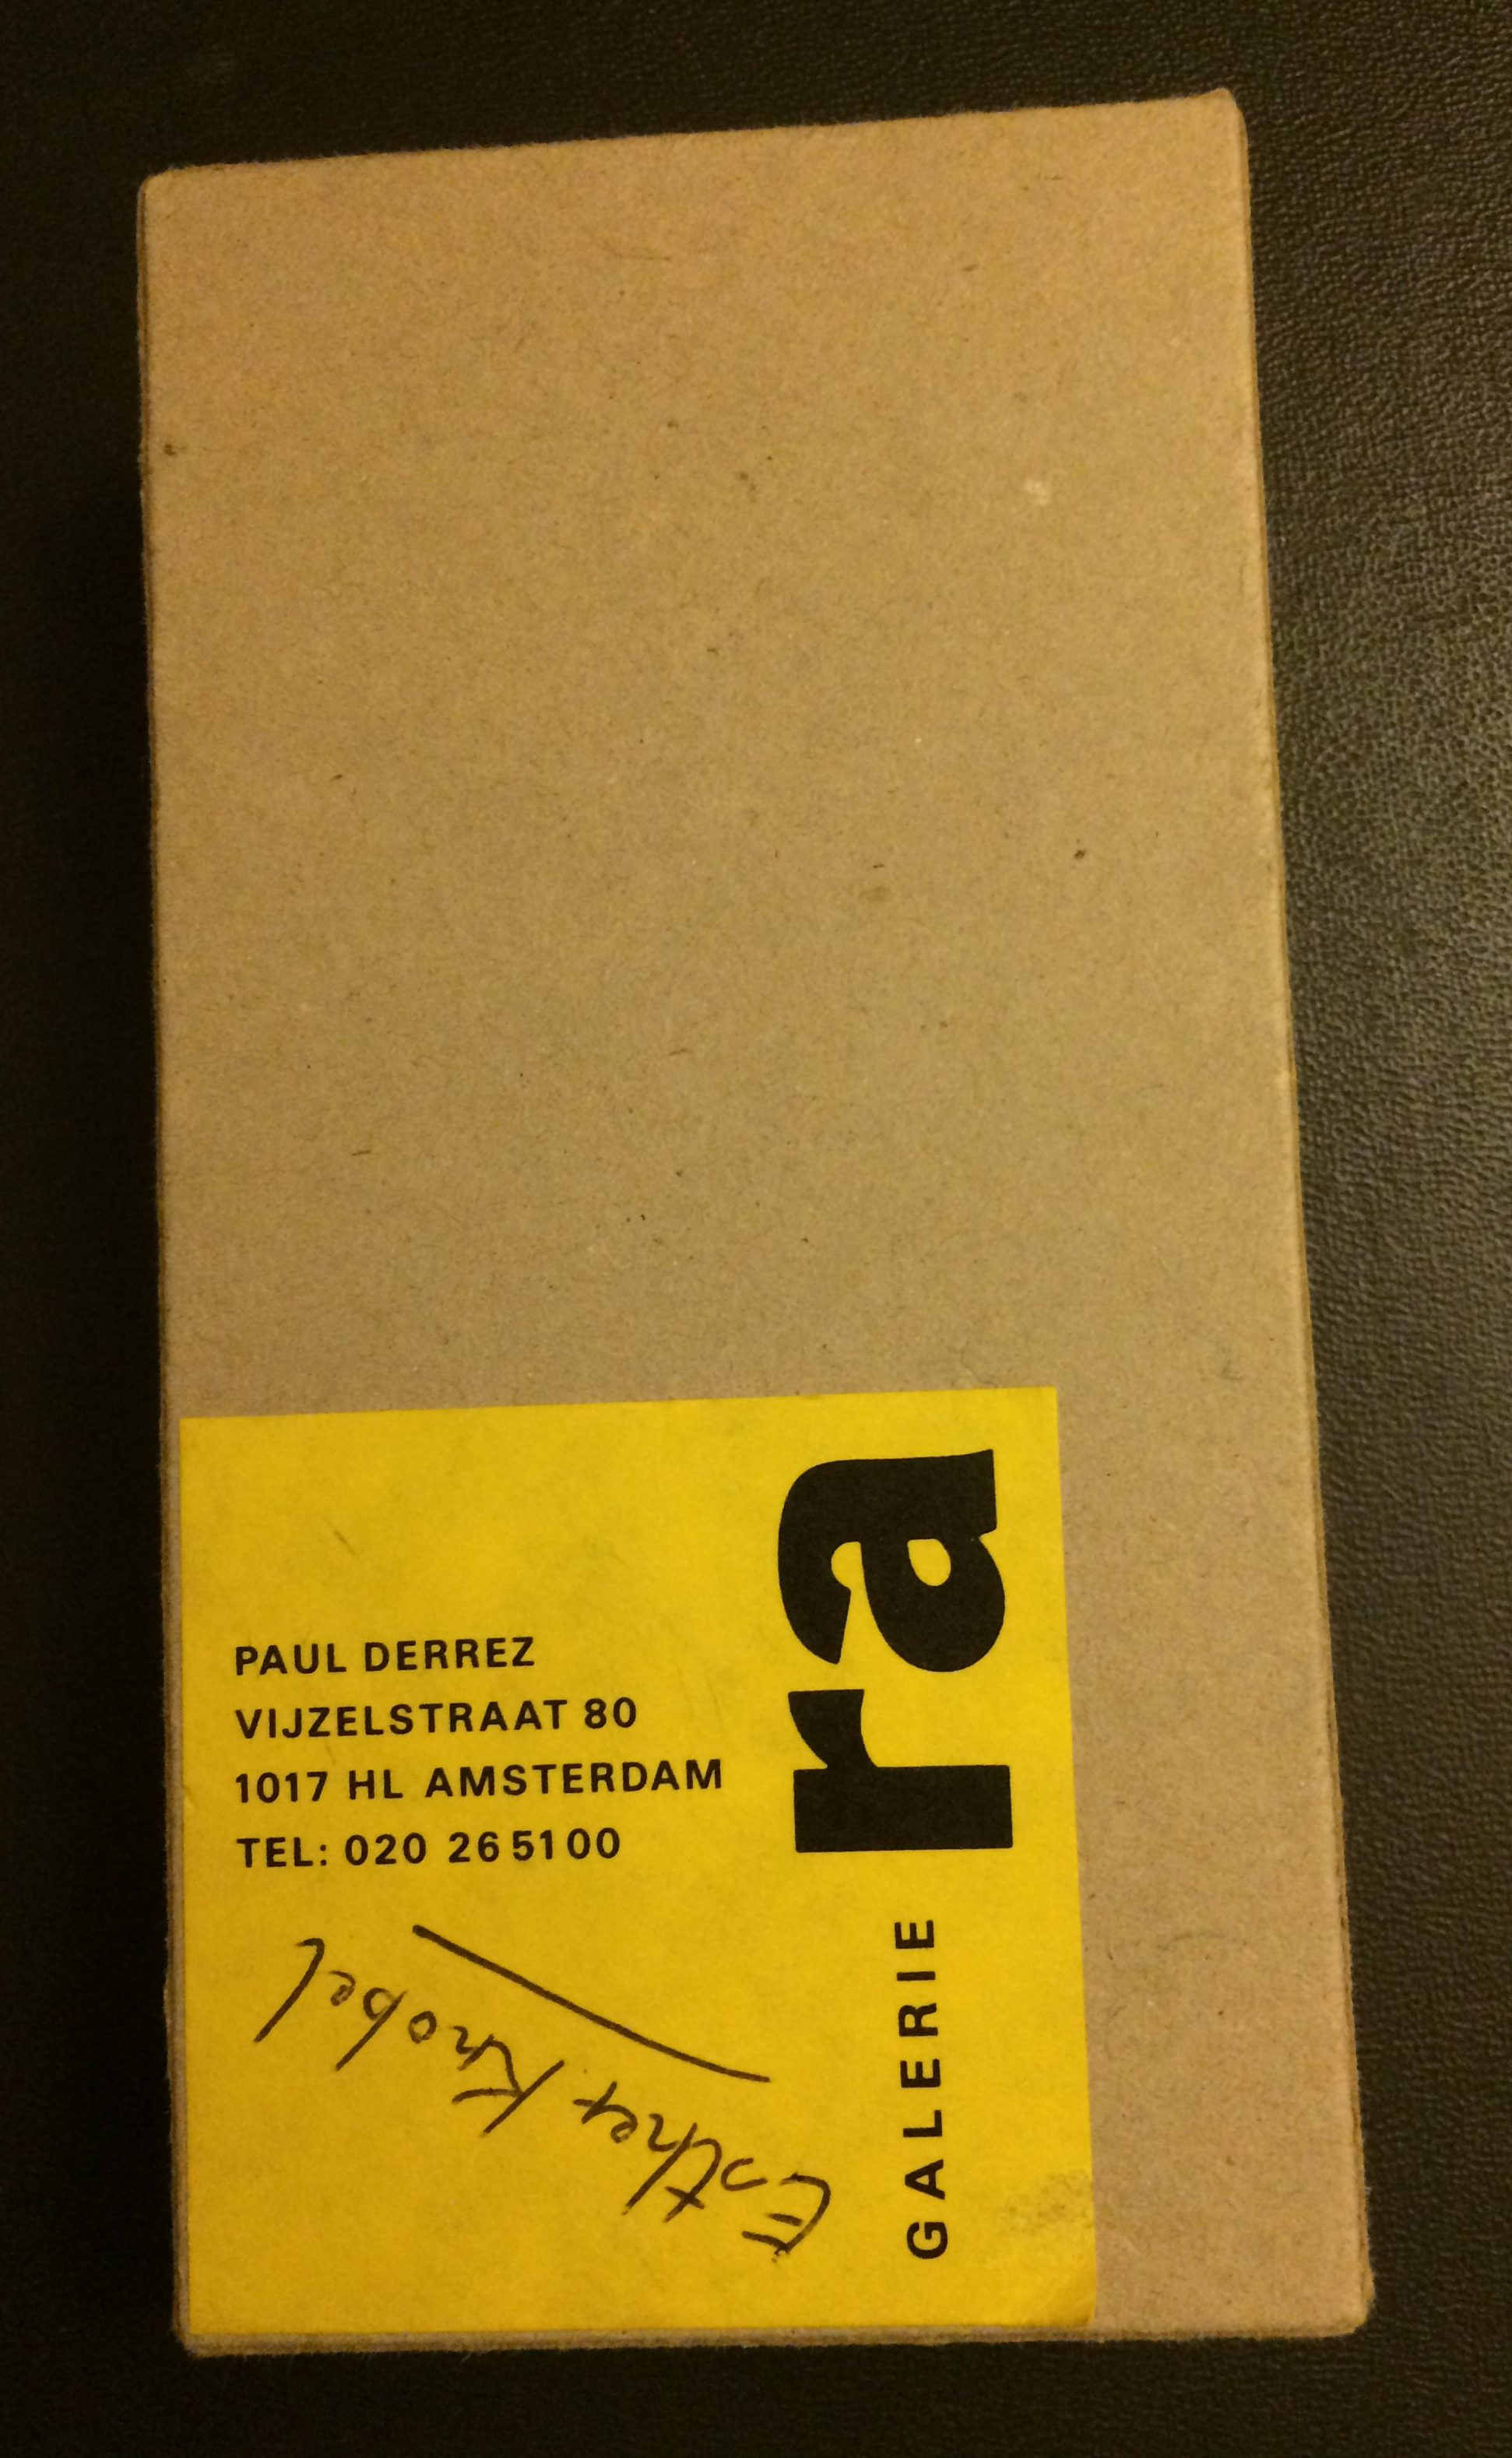 Verpakking Galerie Ra broche Esther Knobel, circa 1993, foto Mattie Boom, karton, drukwerk